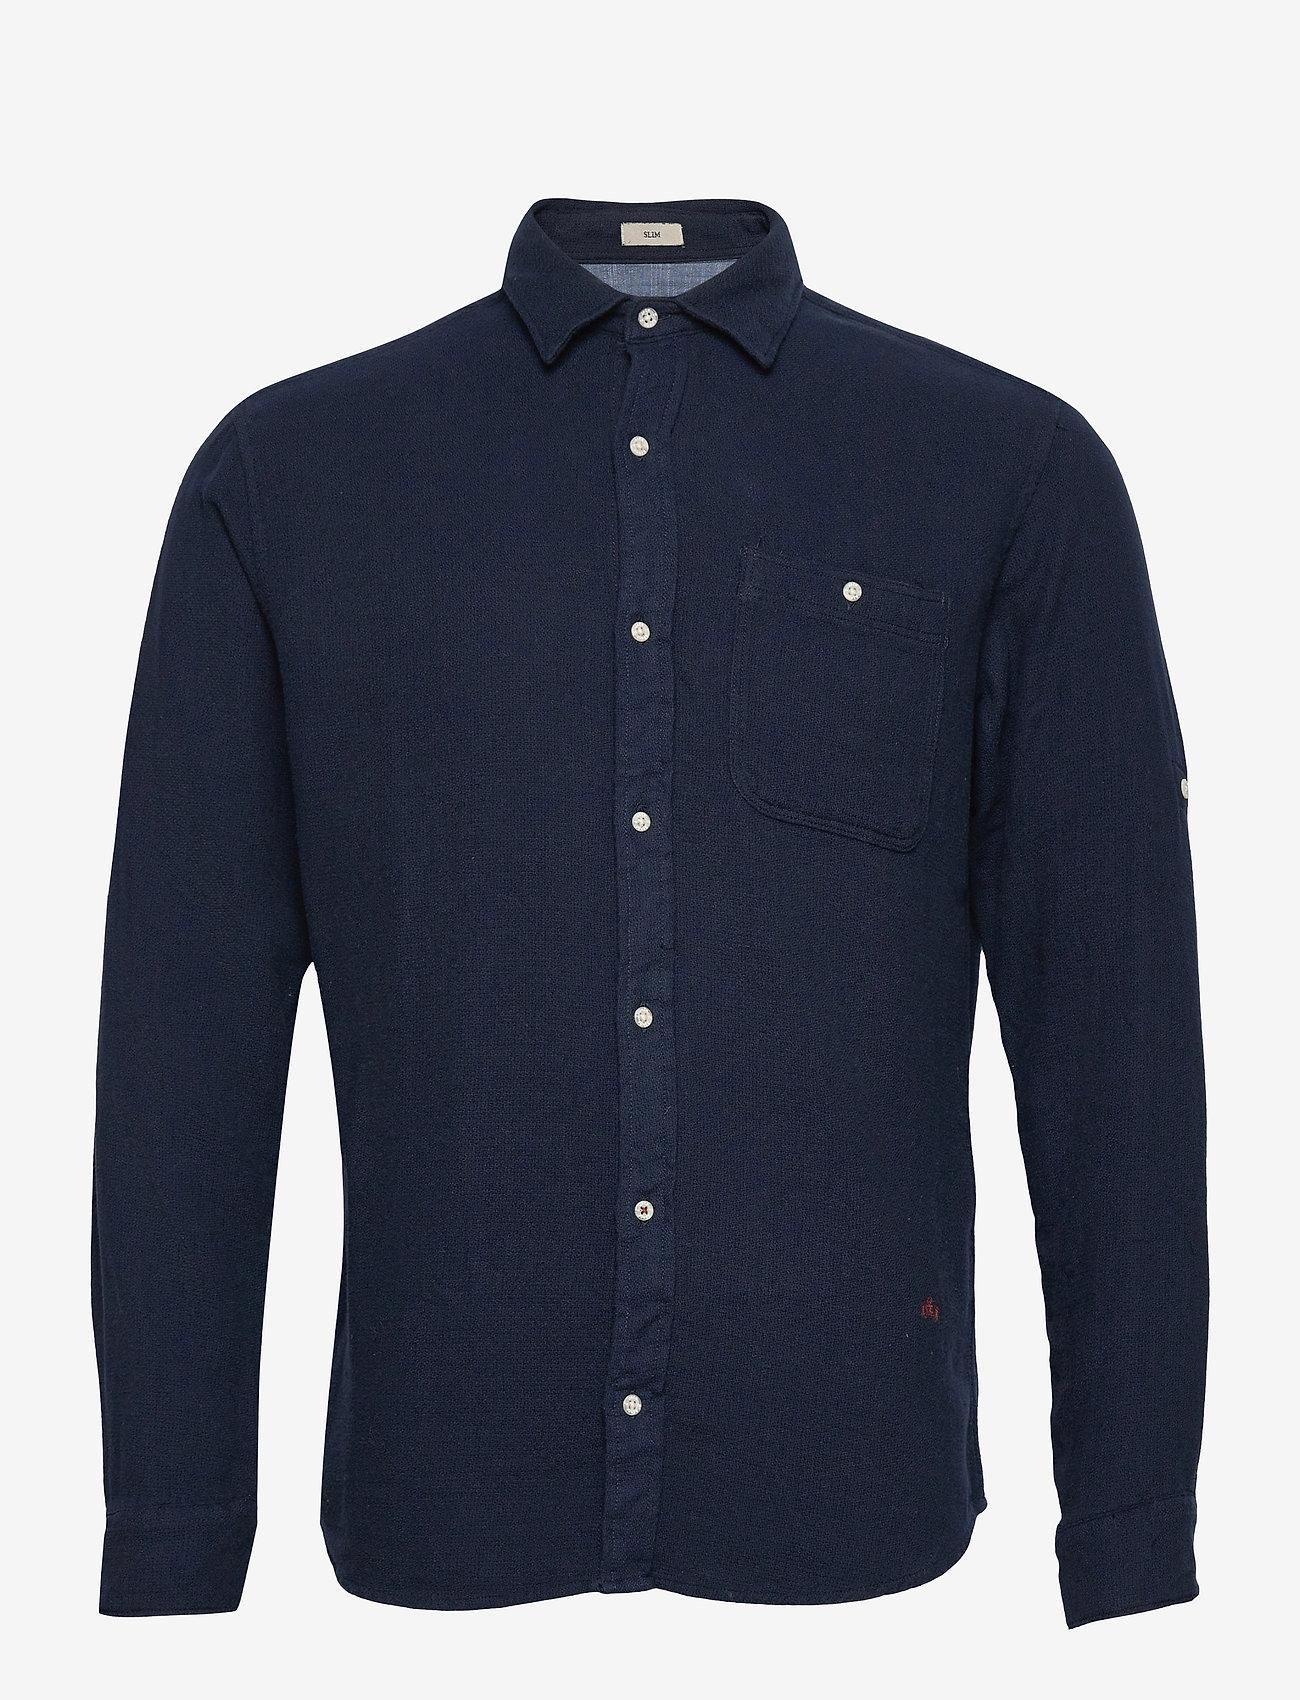 Jack & Jones - JPRBLUNICK MIX SHIRT L/S ONE POCKET LTN - basic skjortor - dark blue denim - 0